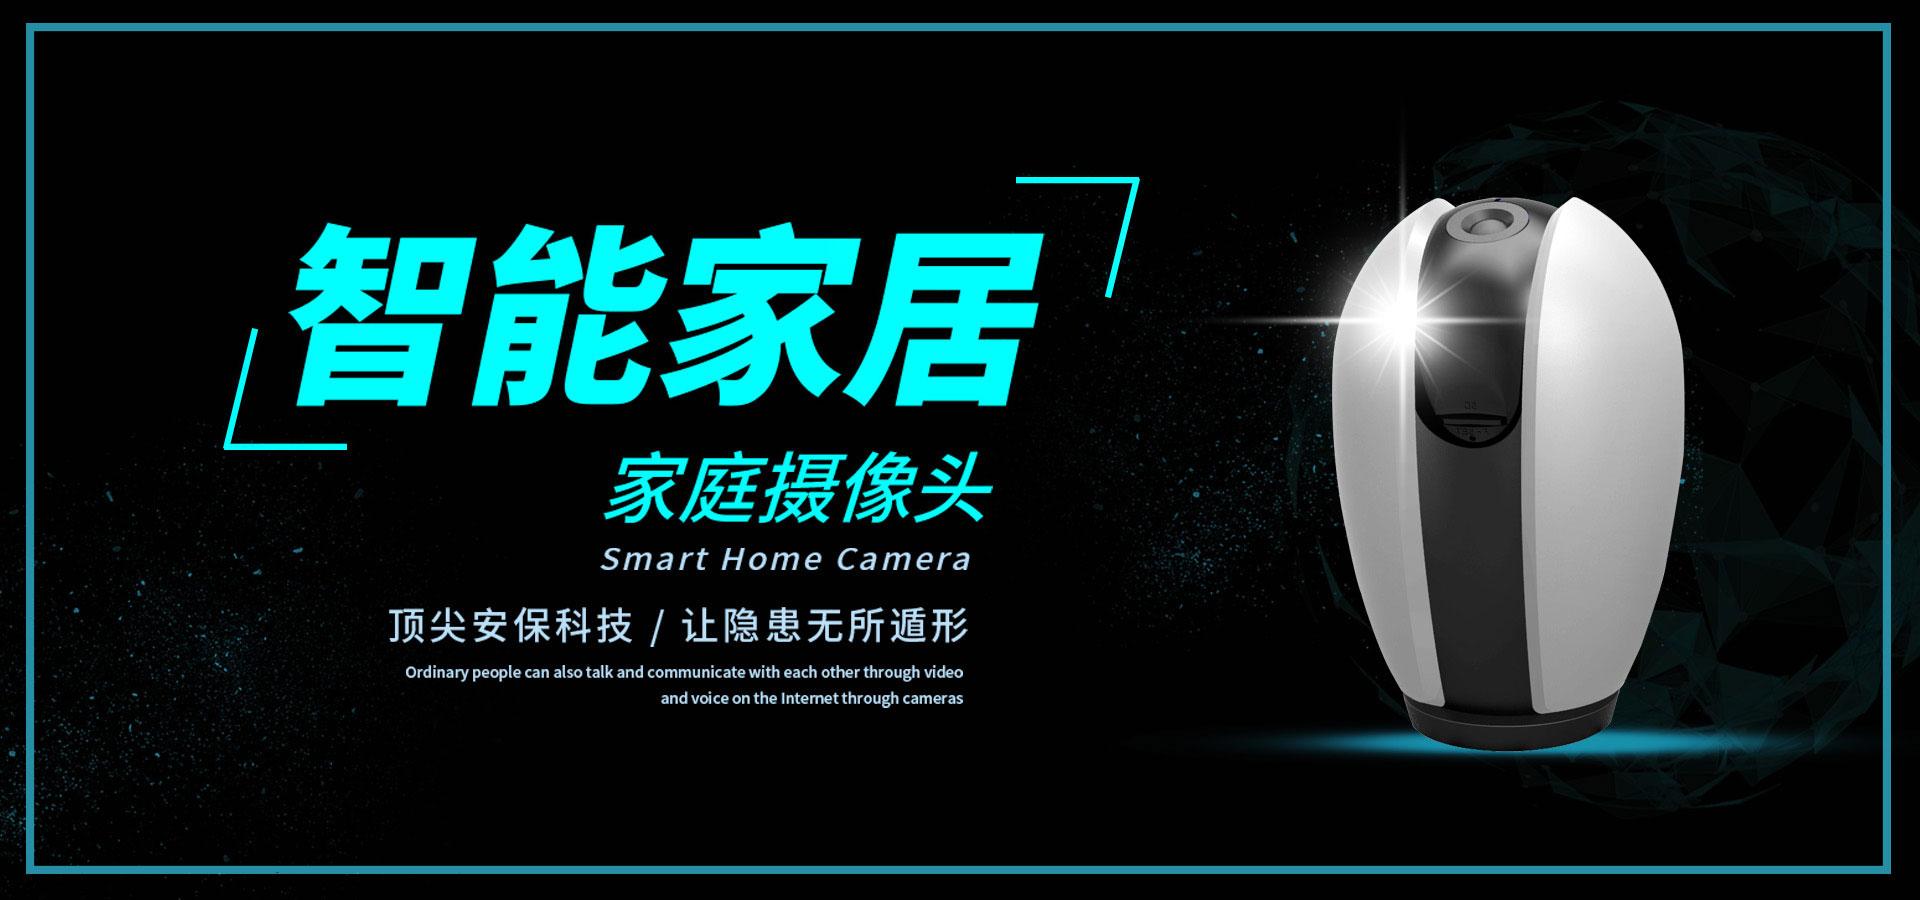 <h4>网络高清摄像头</h4><p>红外夜视、手机远程、防水防尘</p>